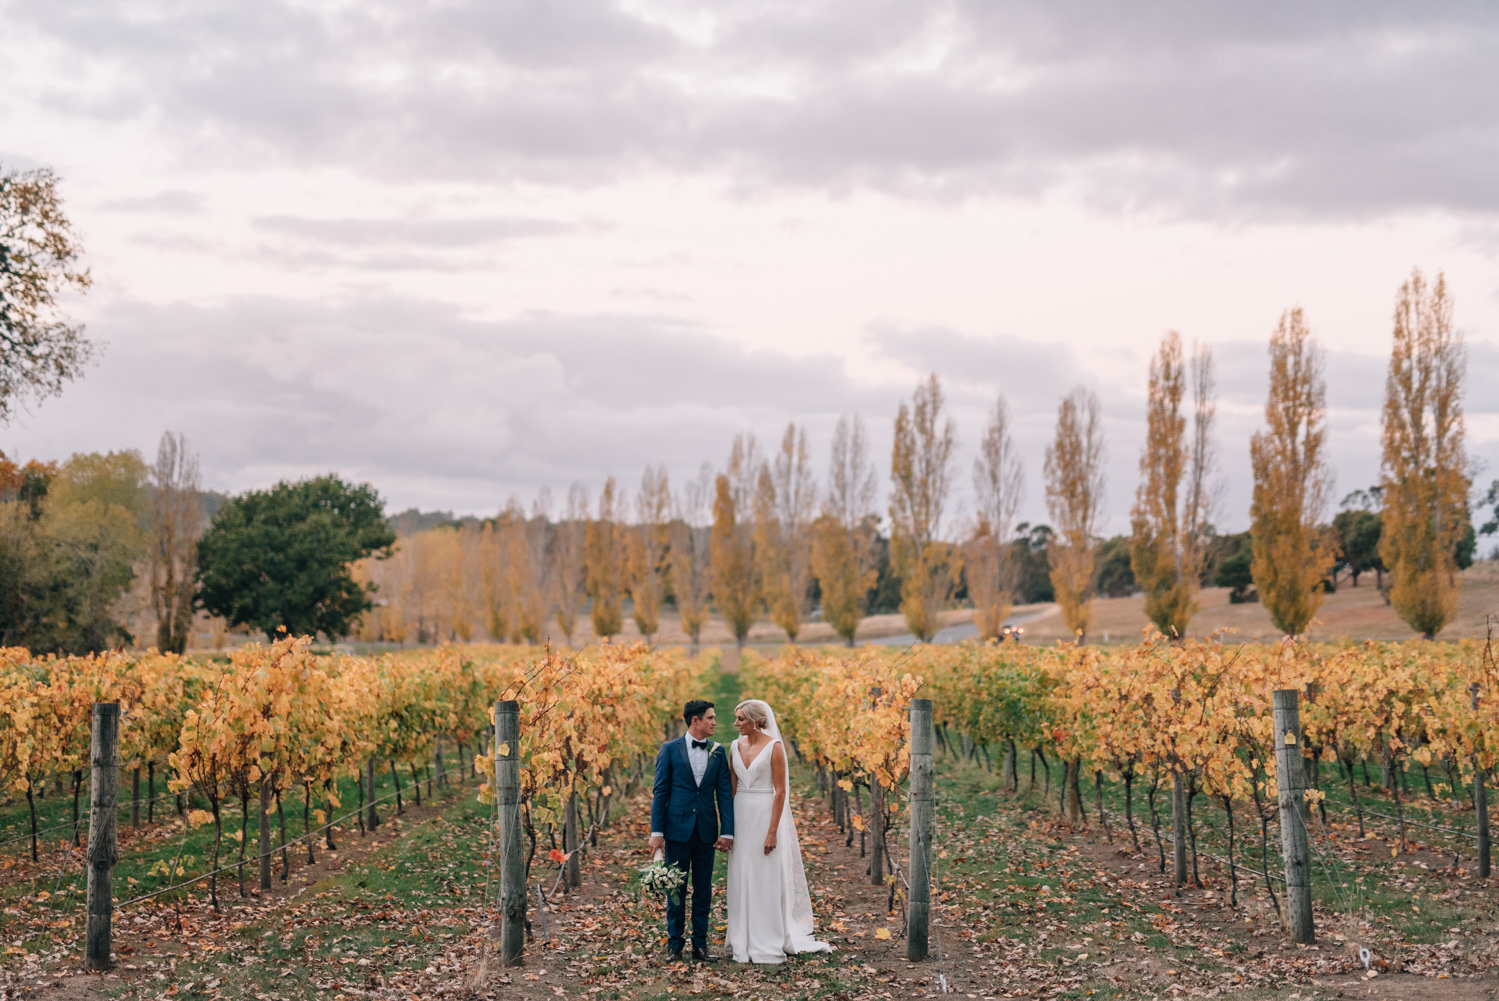 Entally-House-Wedding-Photographer-89.jpg